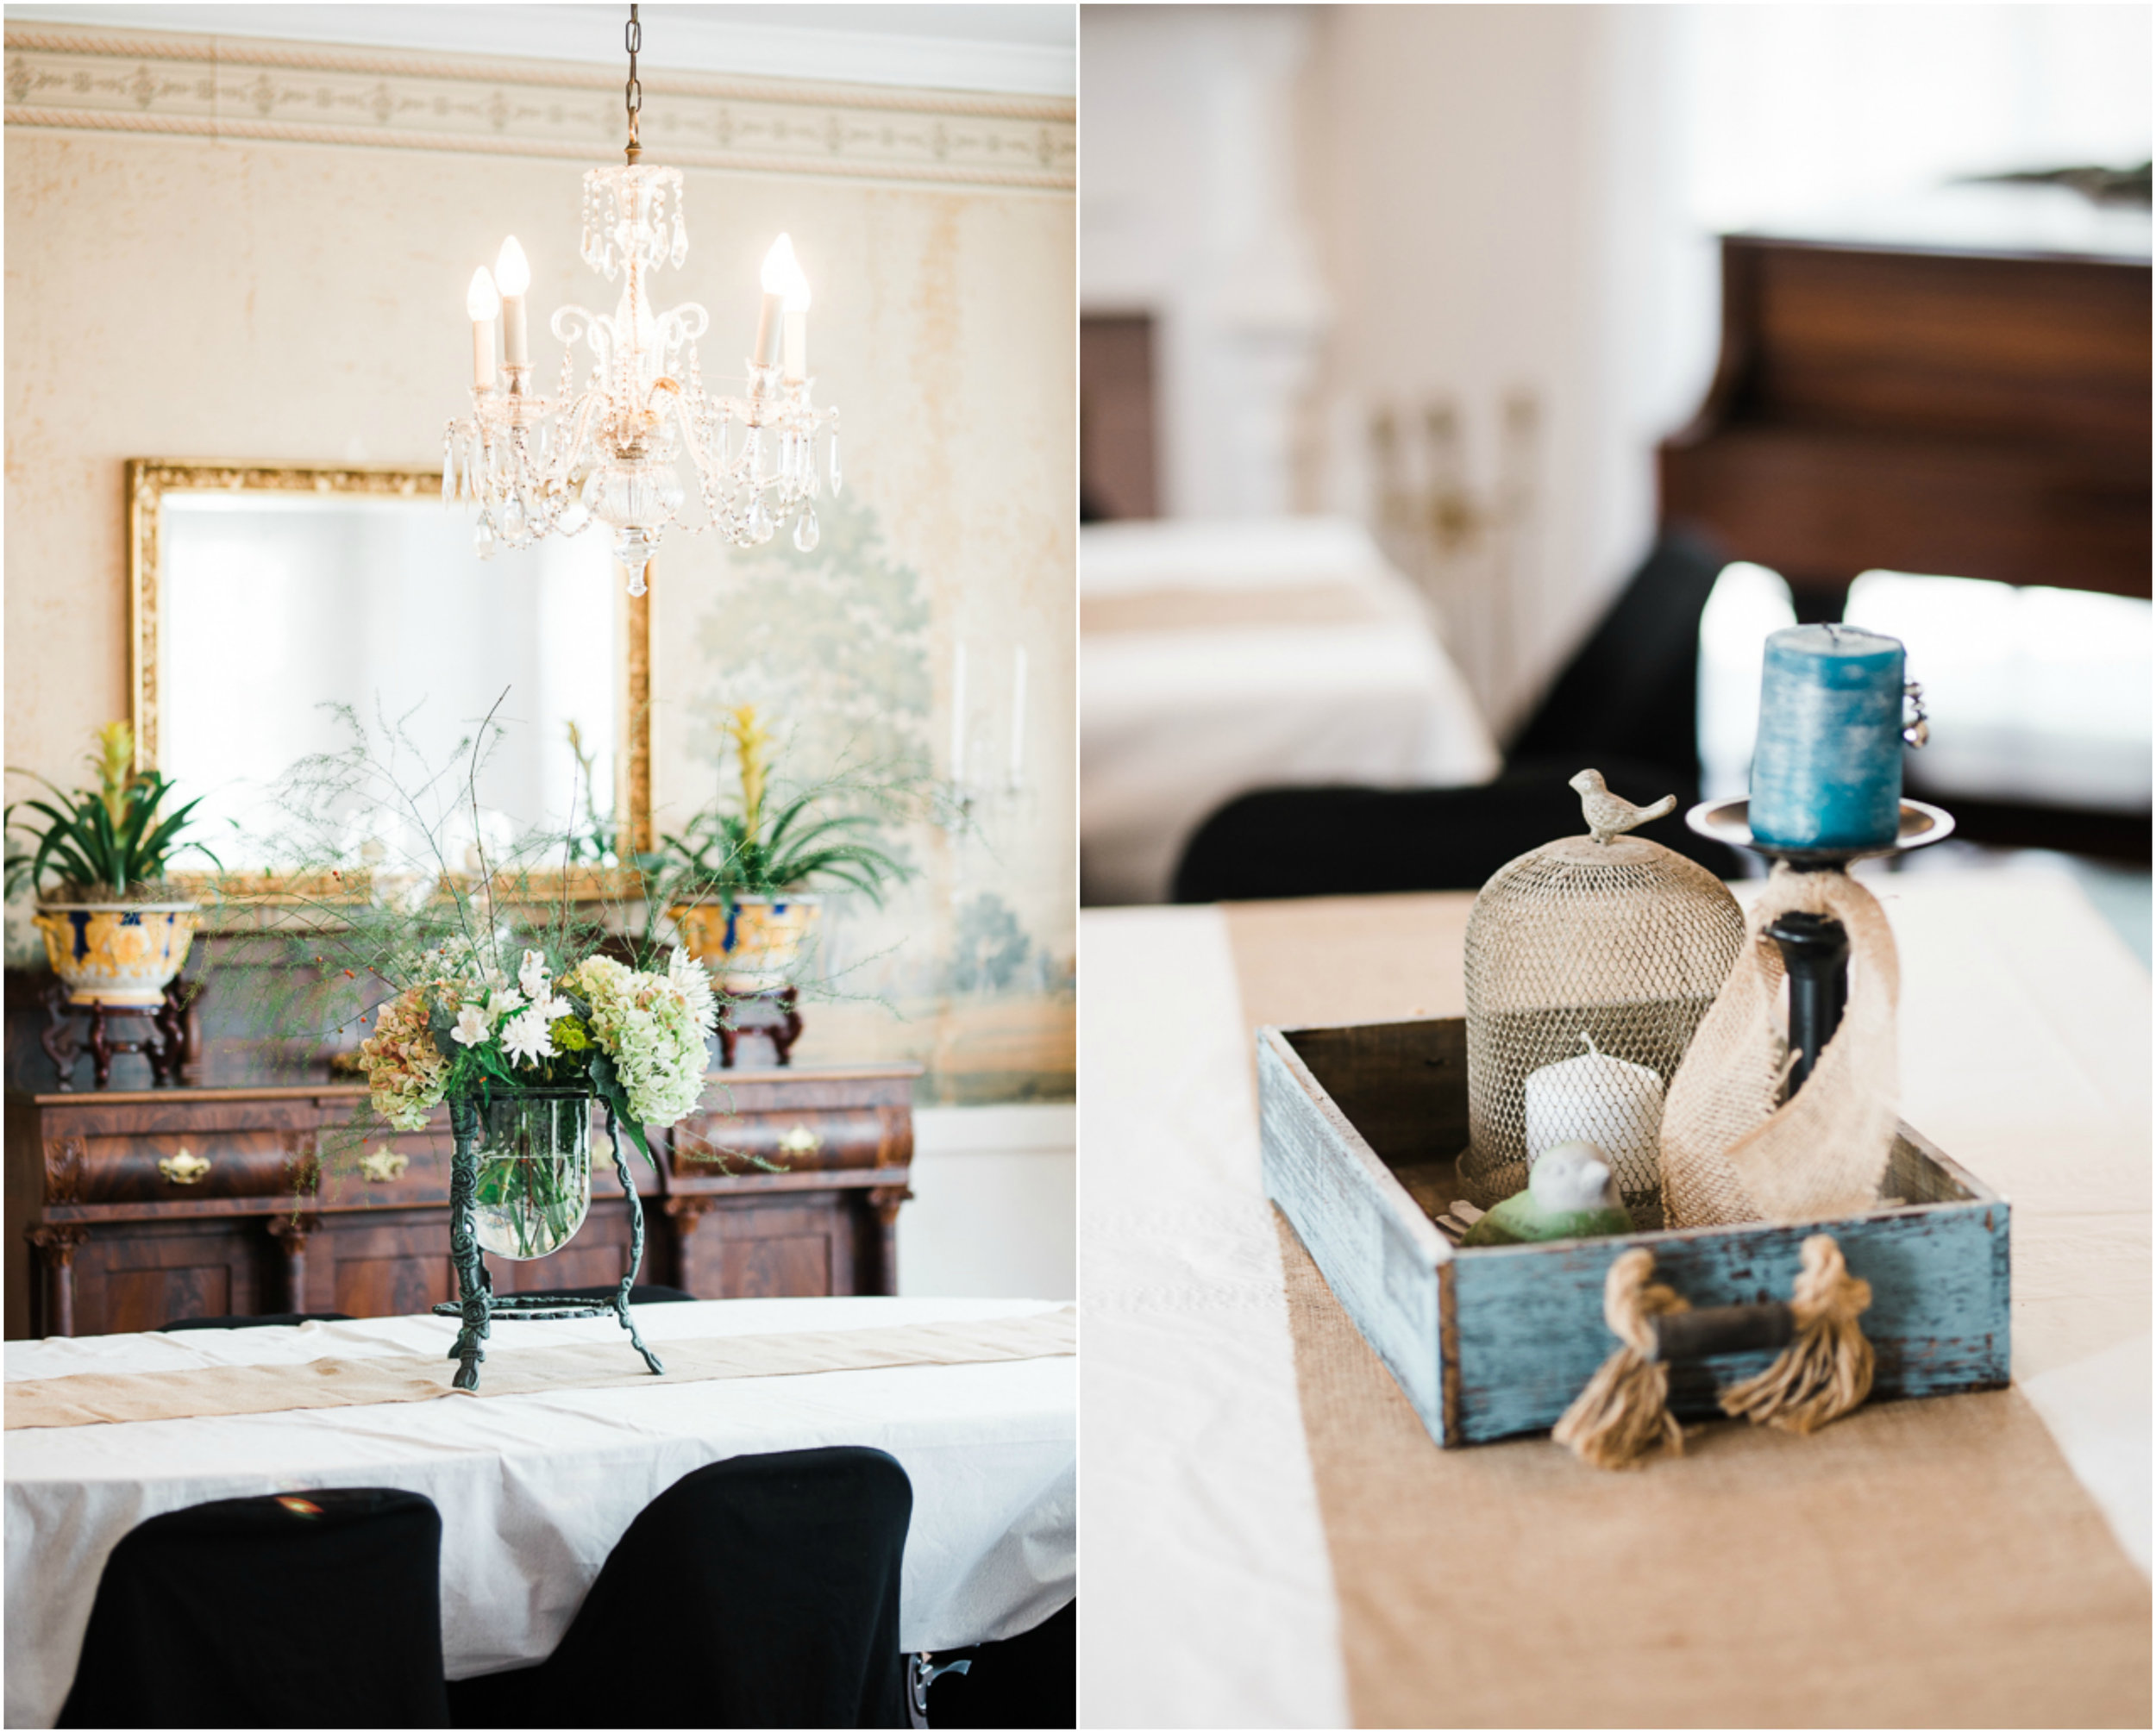 Wedding Center Pieces.jpg